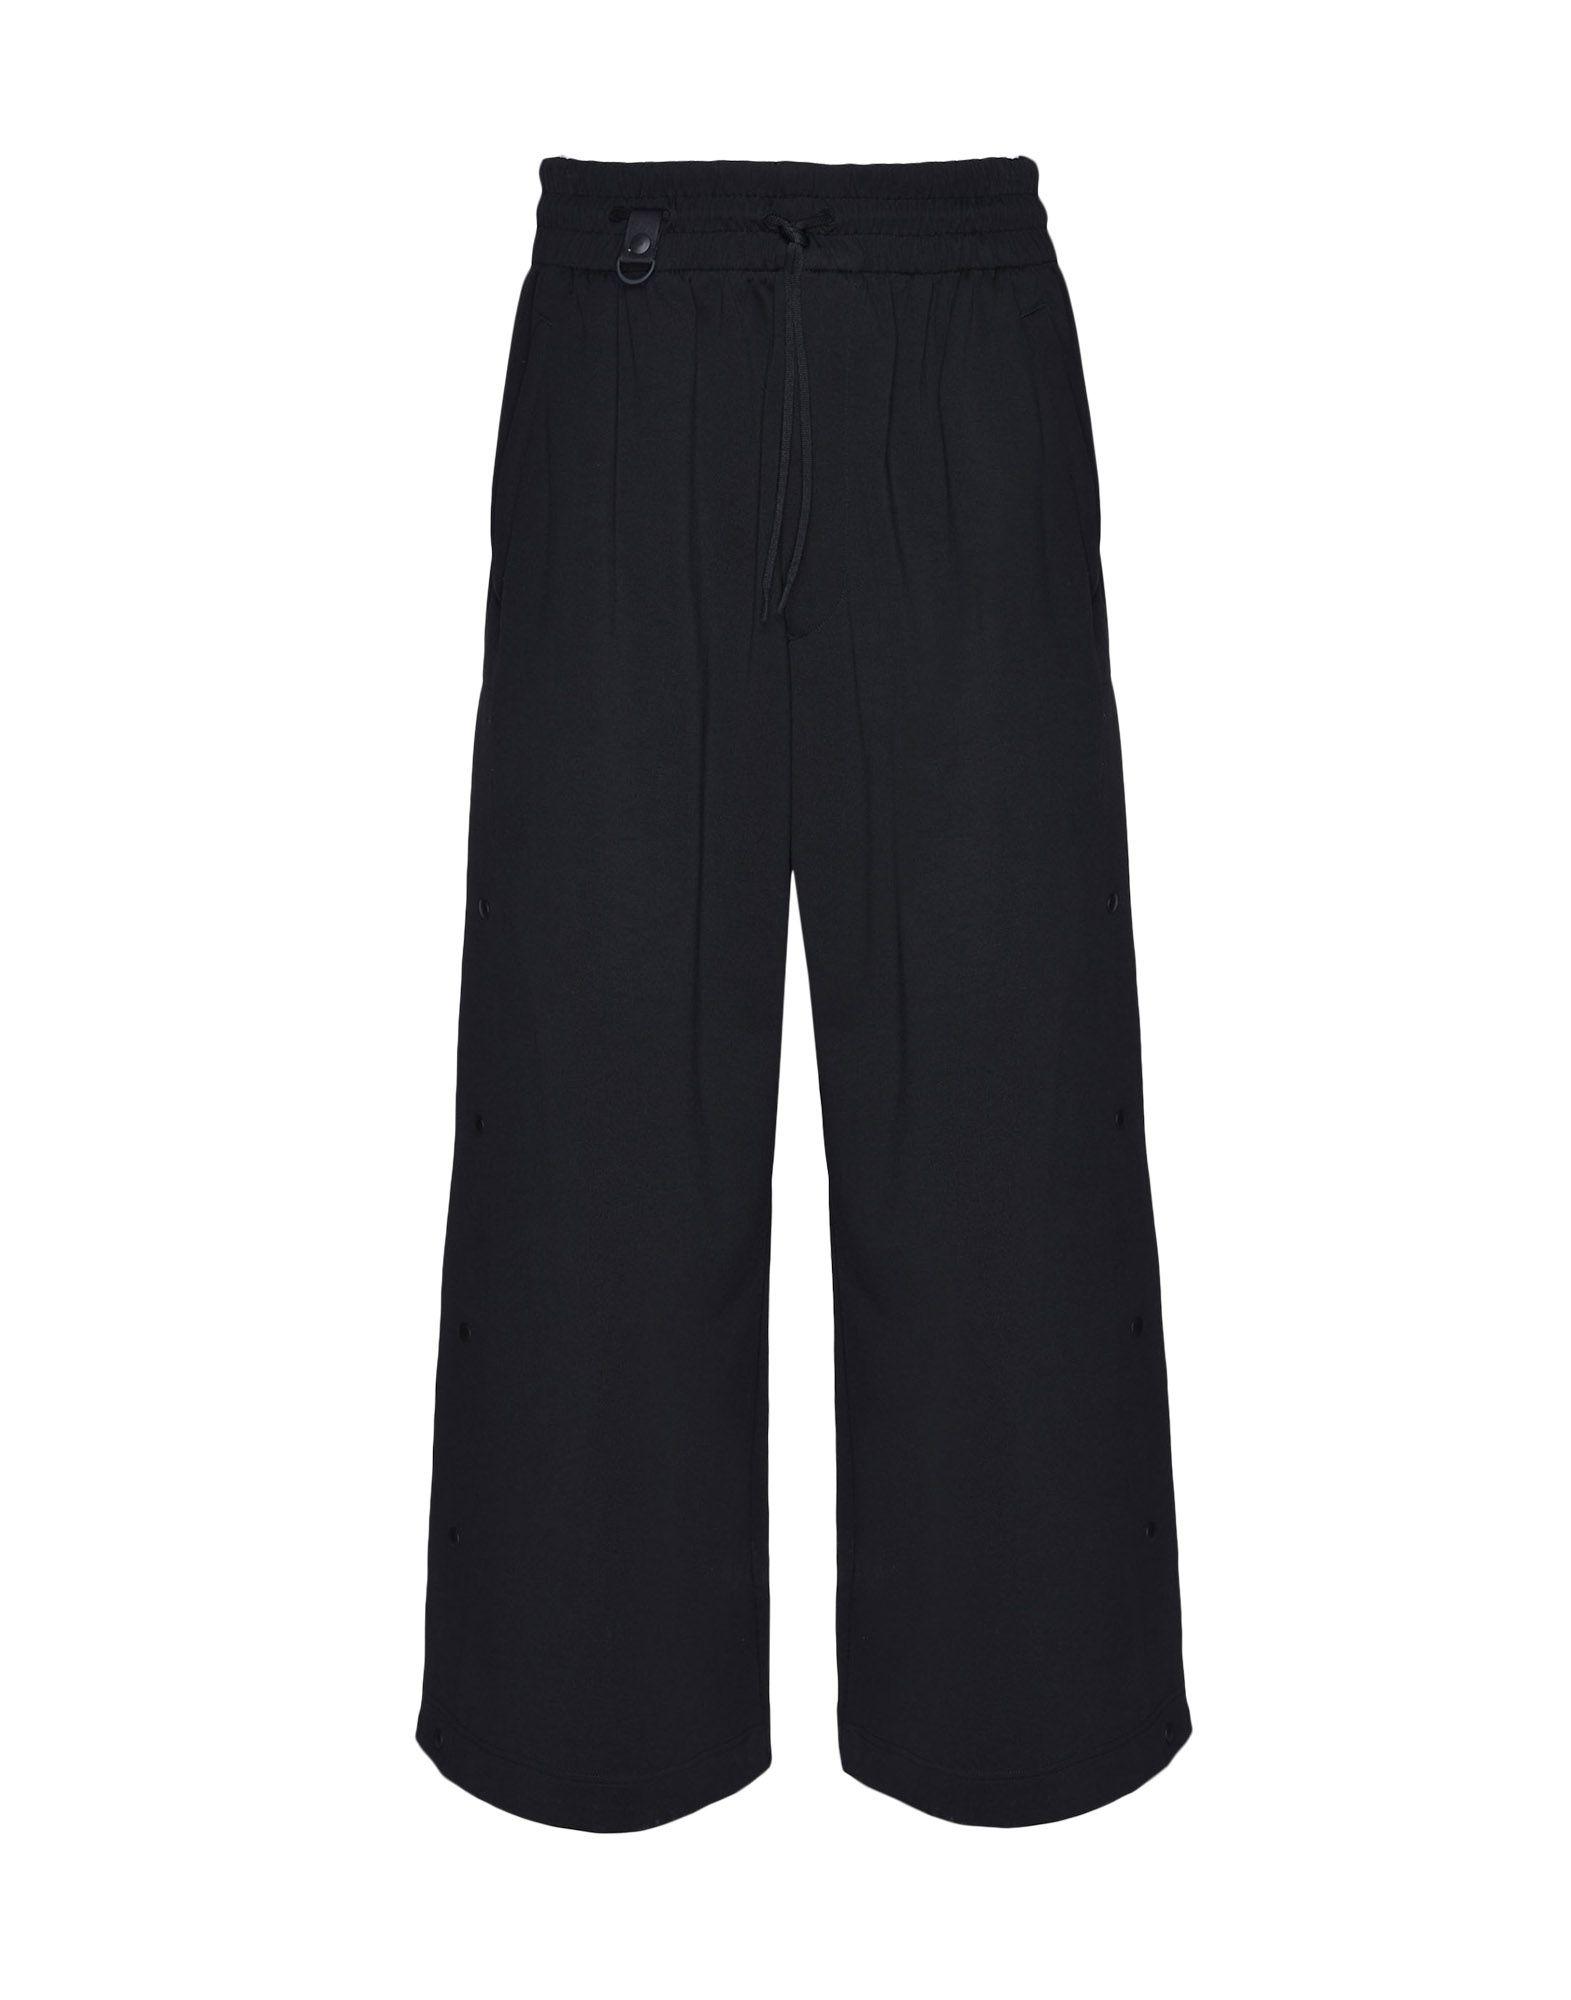 Y-3 Y-3 3-Stripes Matte Snap Track Pants Track pant Man f